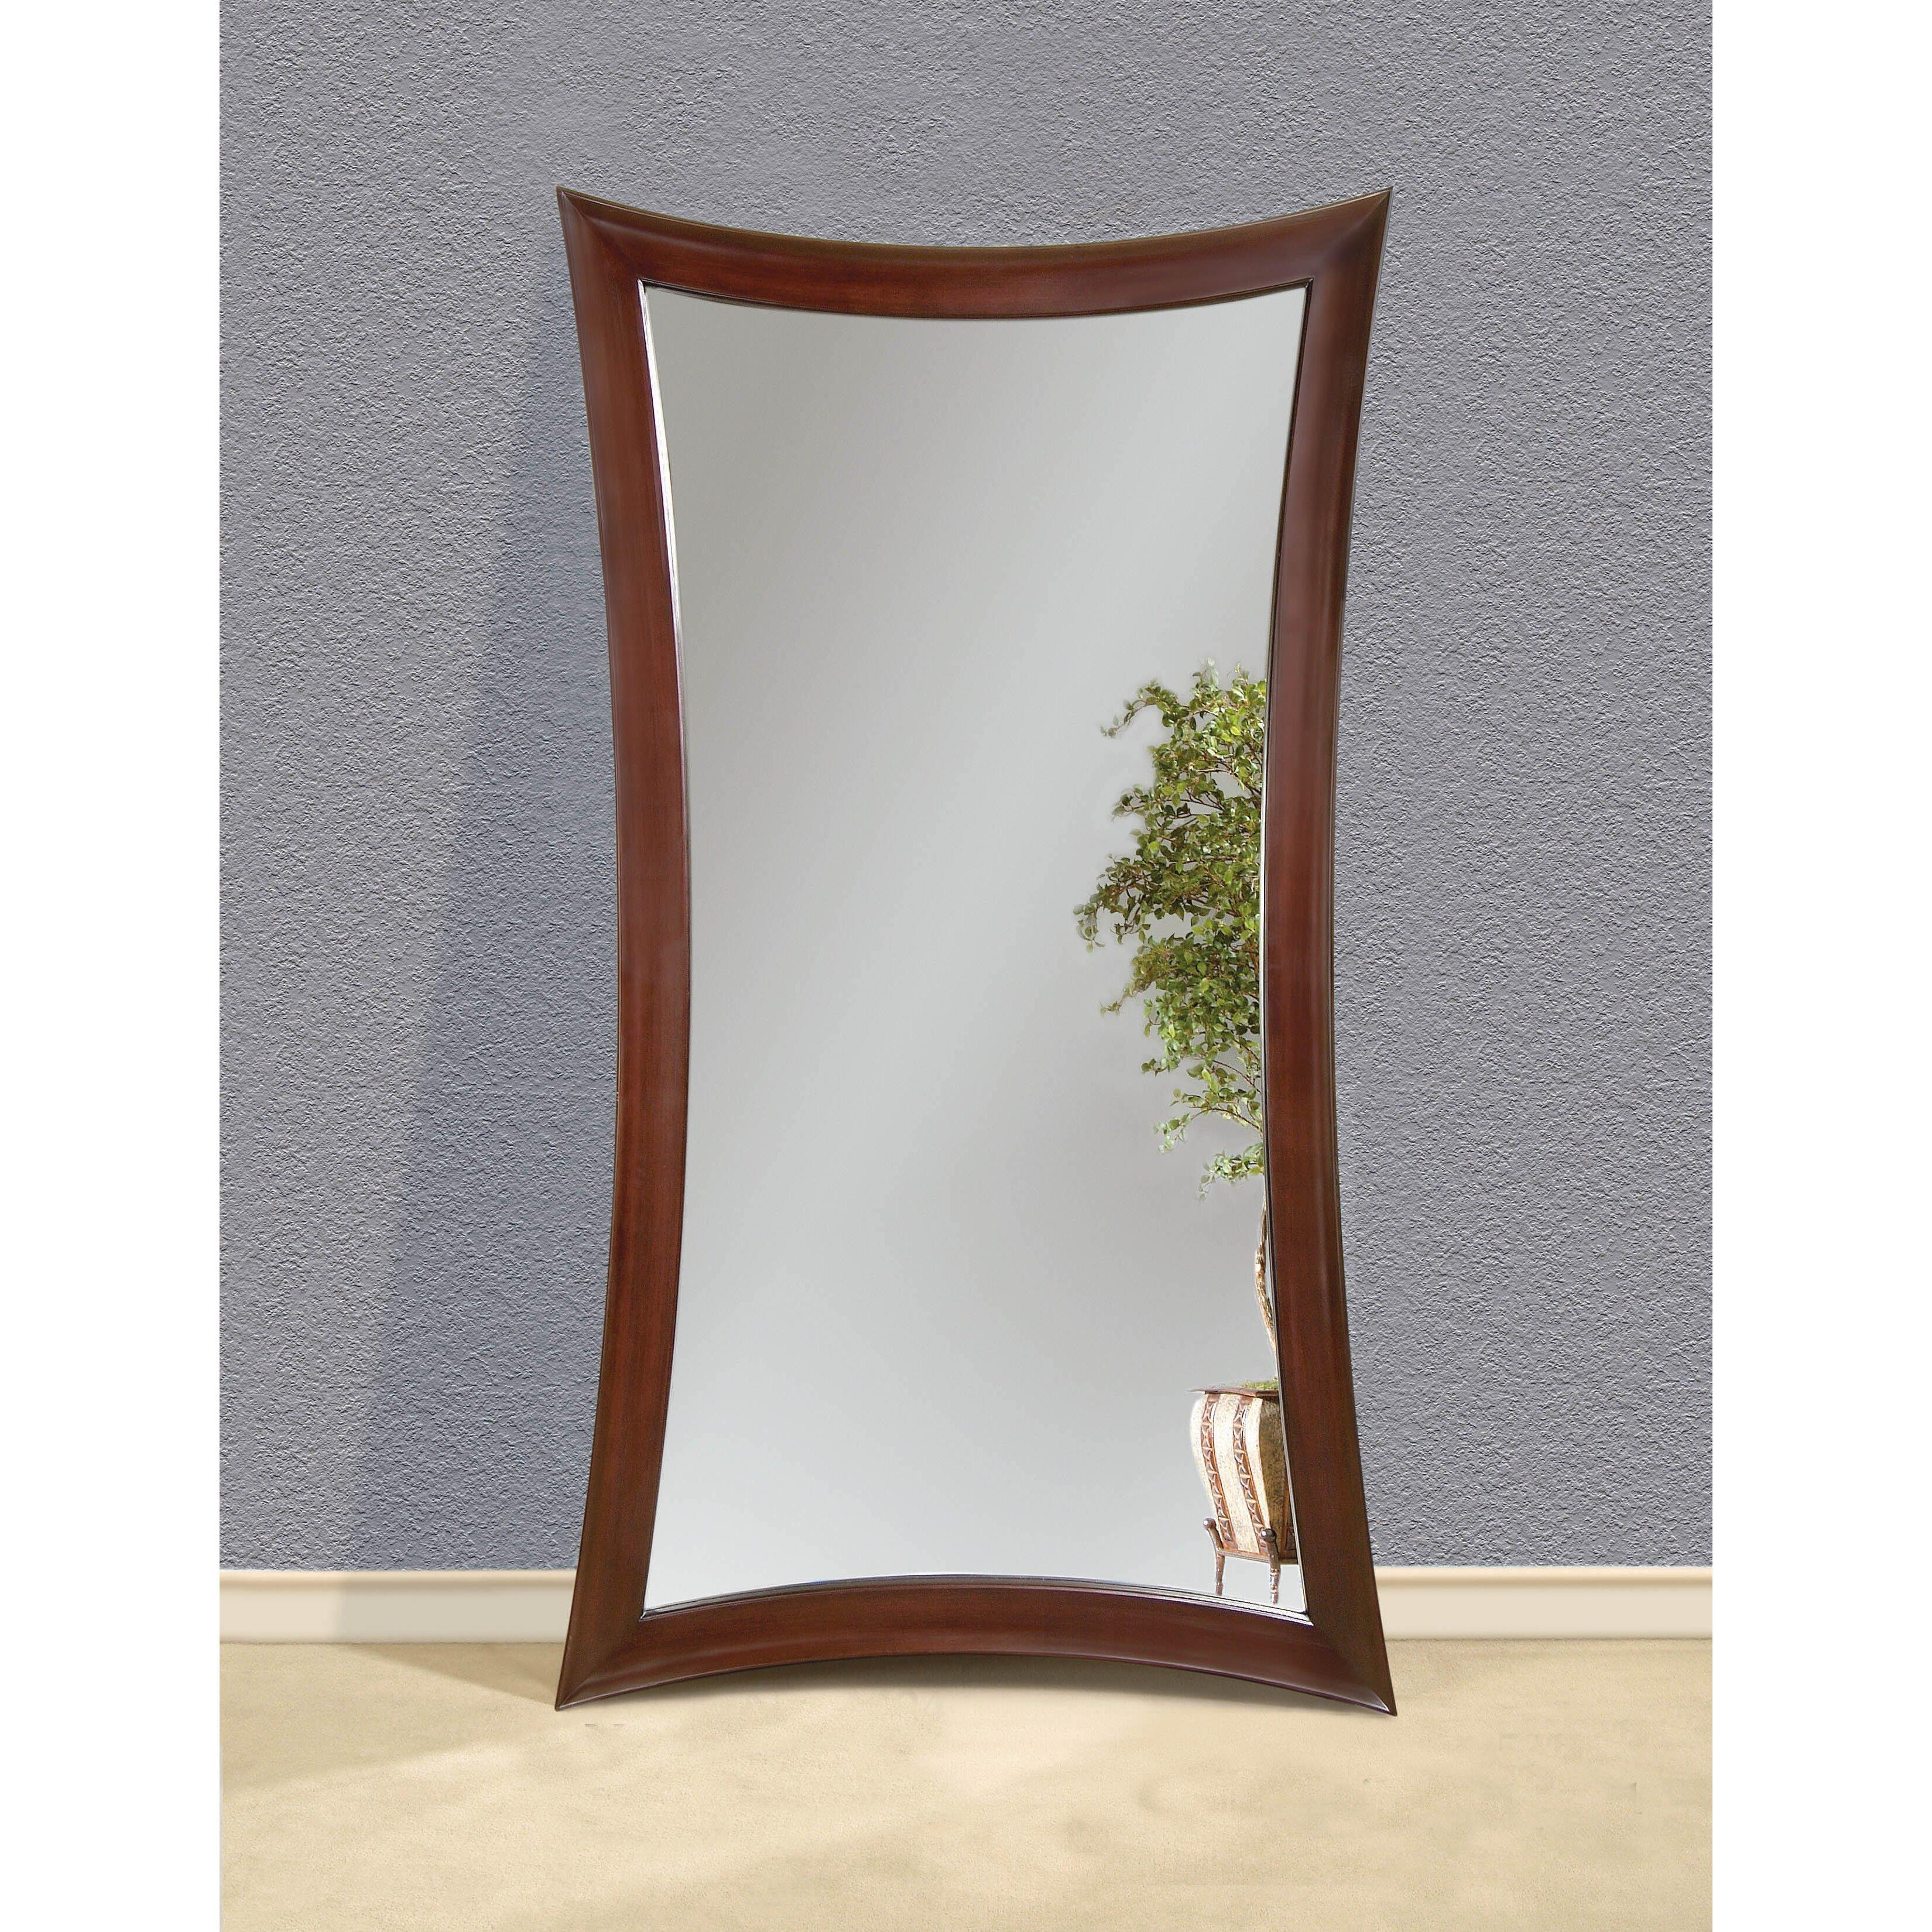 Oak bar mirrors with shelves - Irregular Merlot Wood Leaner Mirror